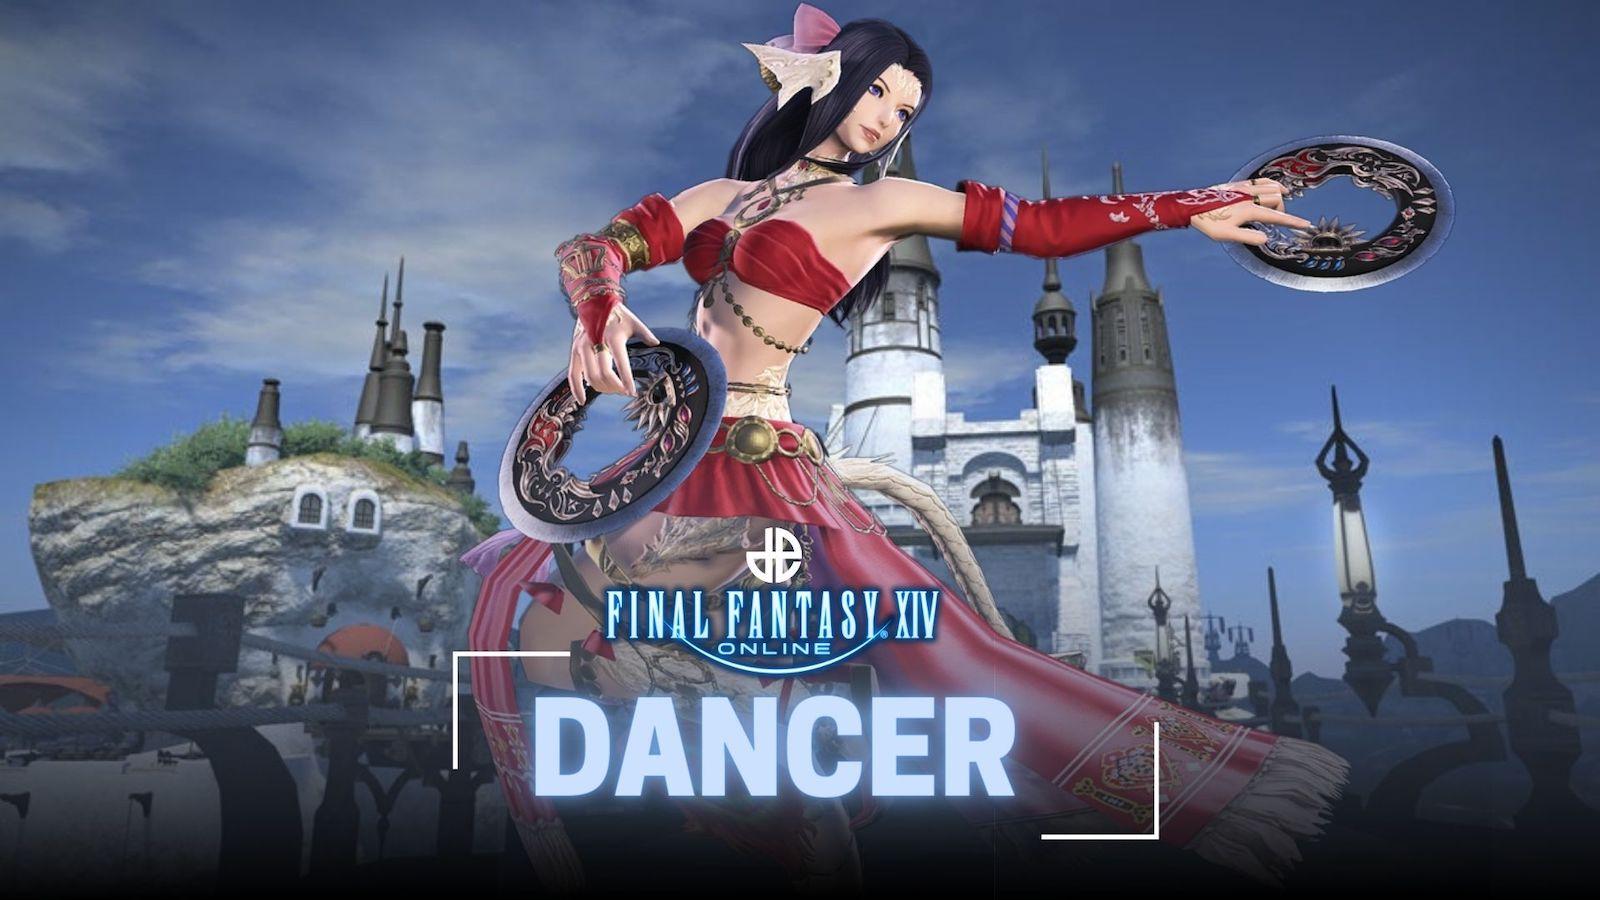 How to Unlock the Dancer Job in FFXIV: Online?